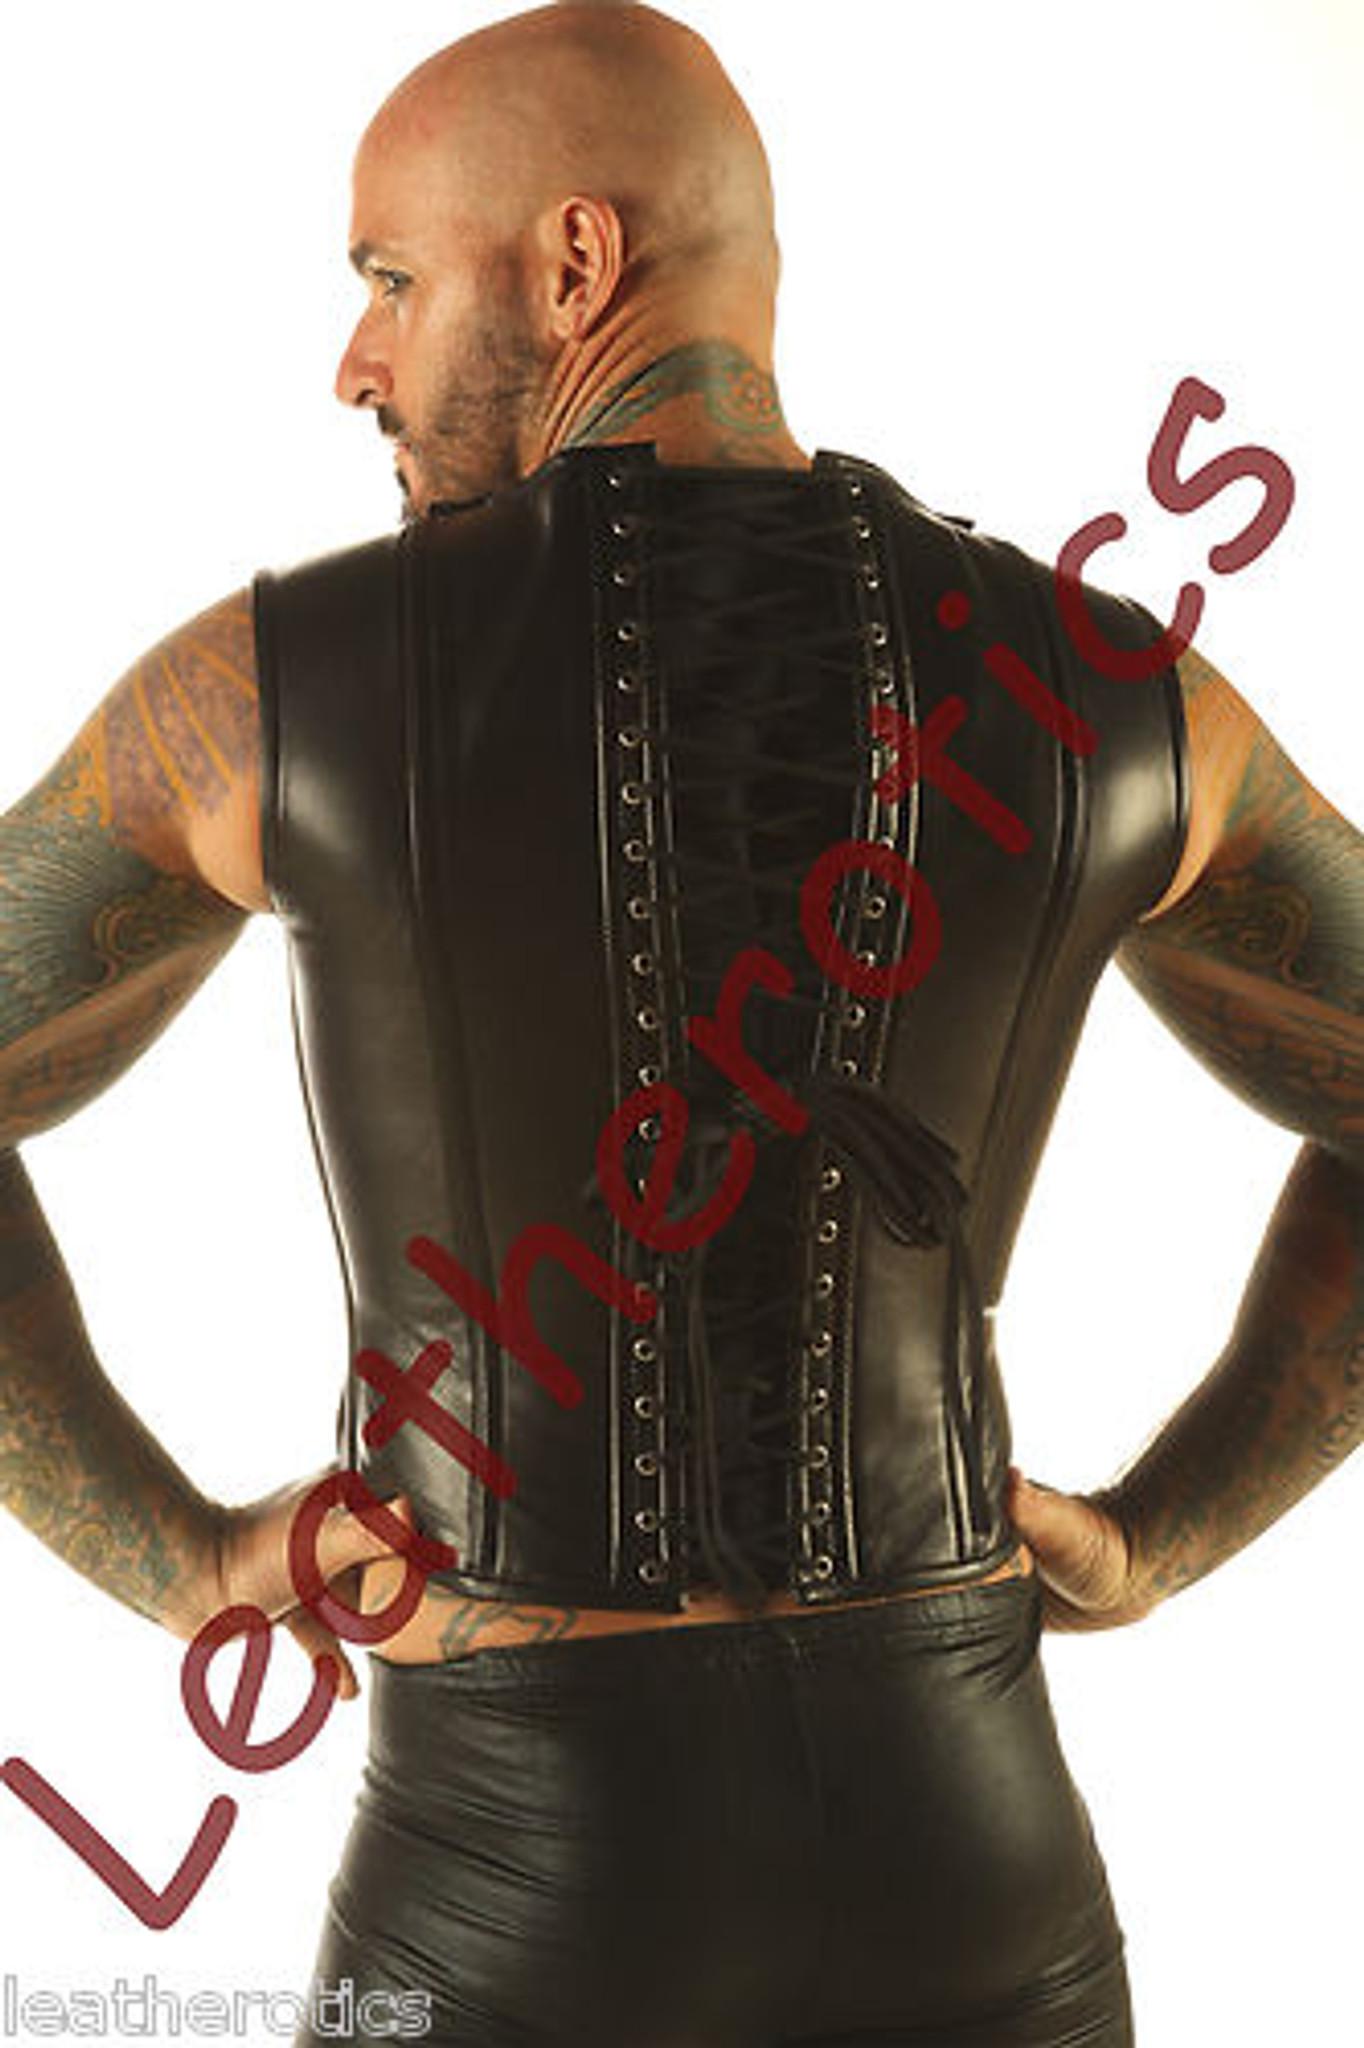 cab78d4f9e ... Full Grain Leather Mens Vest Waistcoat Victorian Steel Boned Shirt VC9  - back